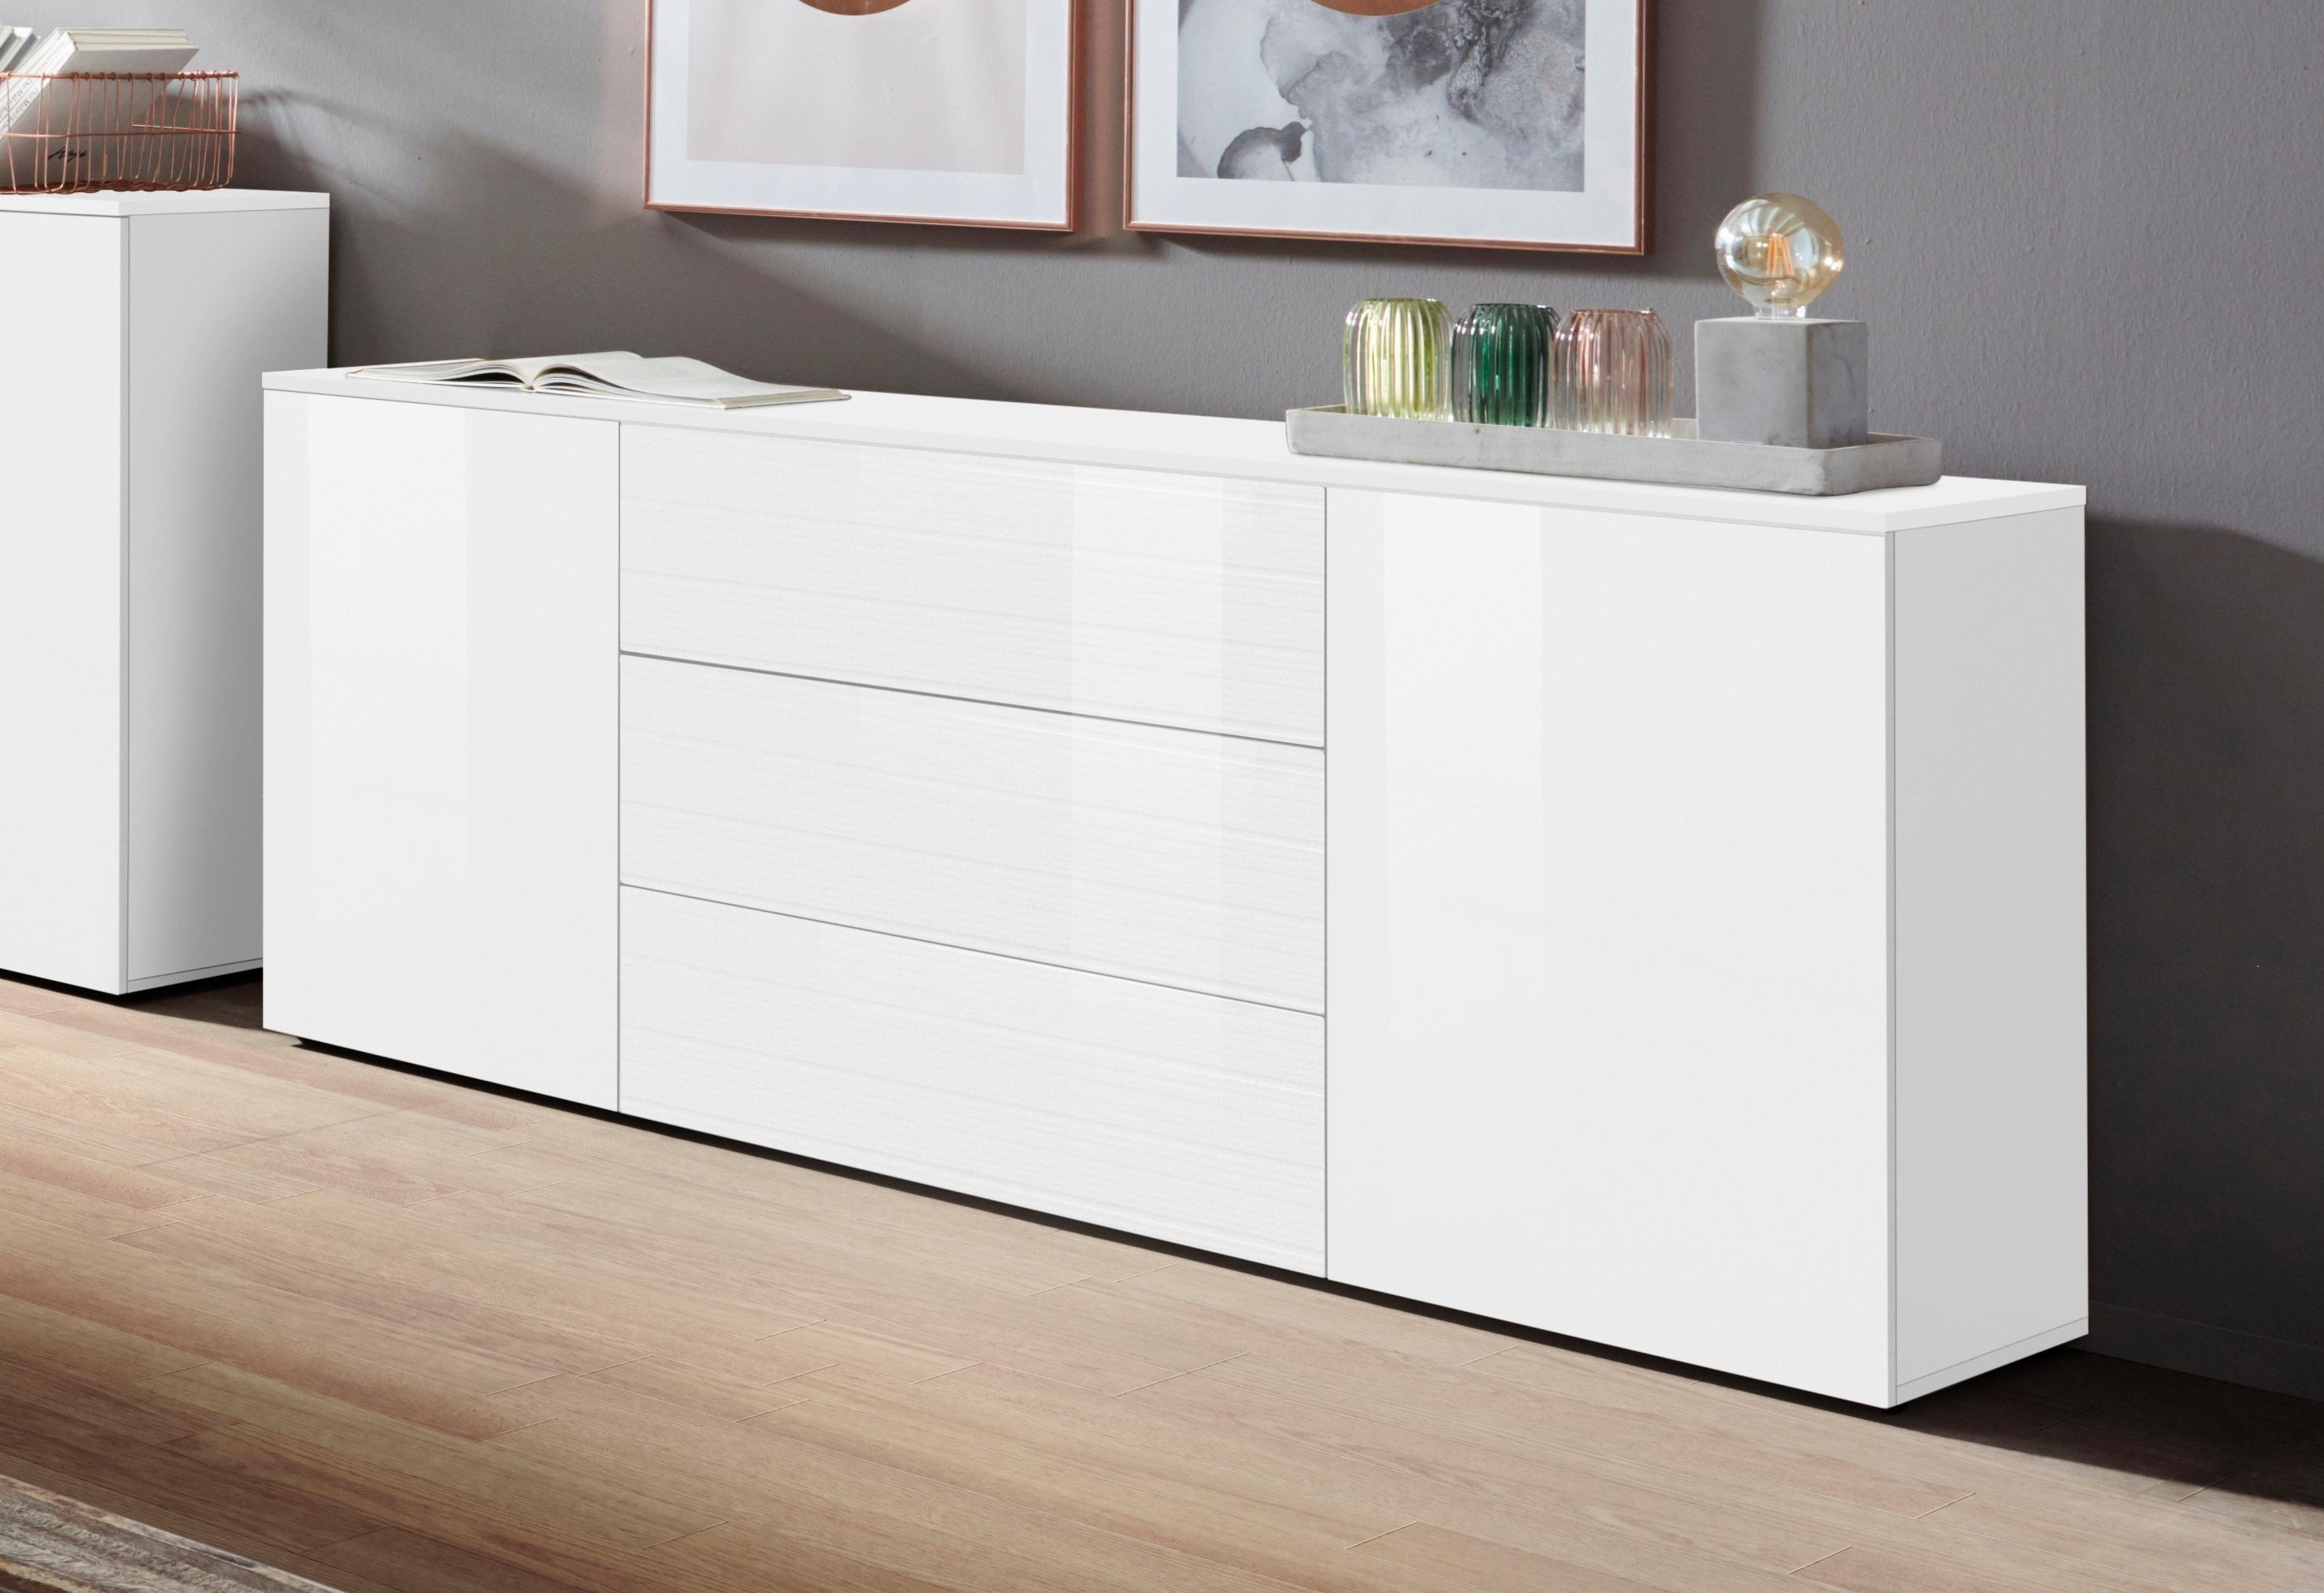 borchardt Möbel dressoir Savannah Breedte 166 cm nu online kopen bij OTTO